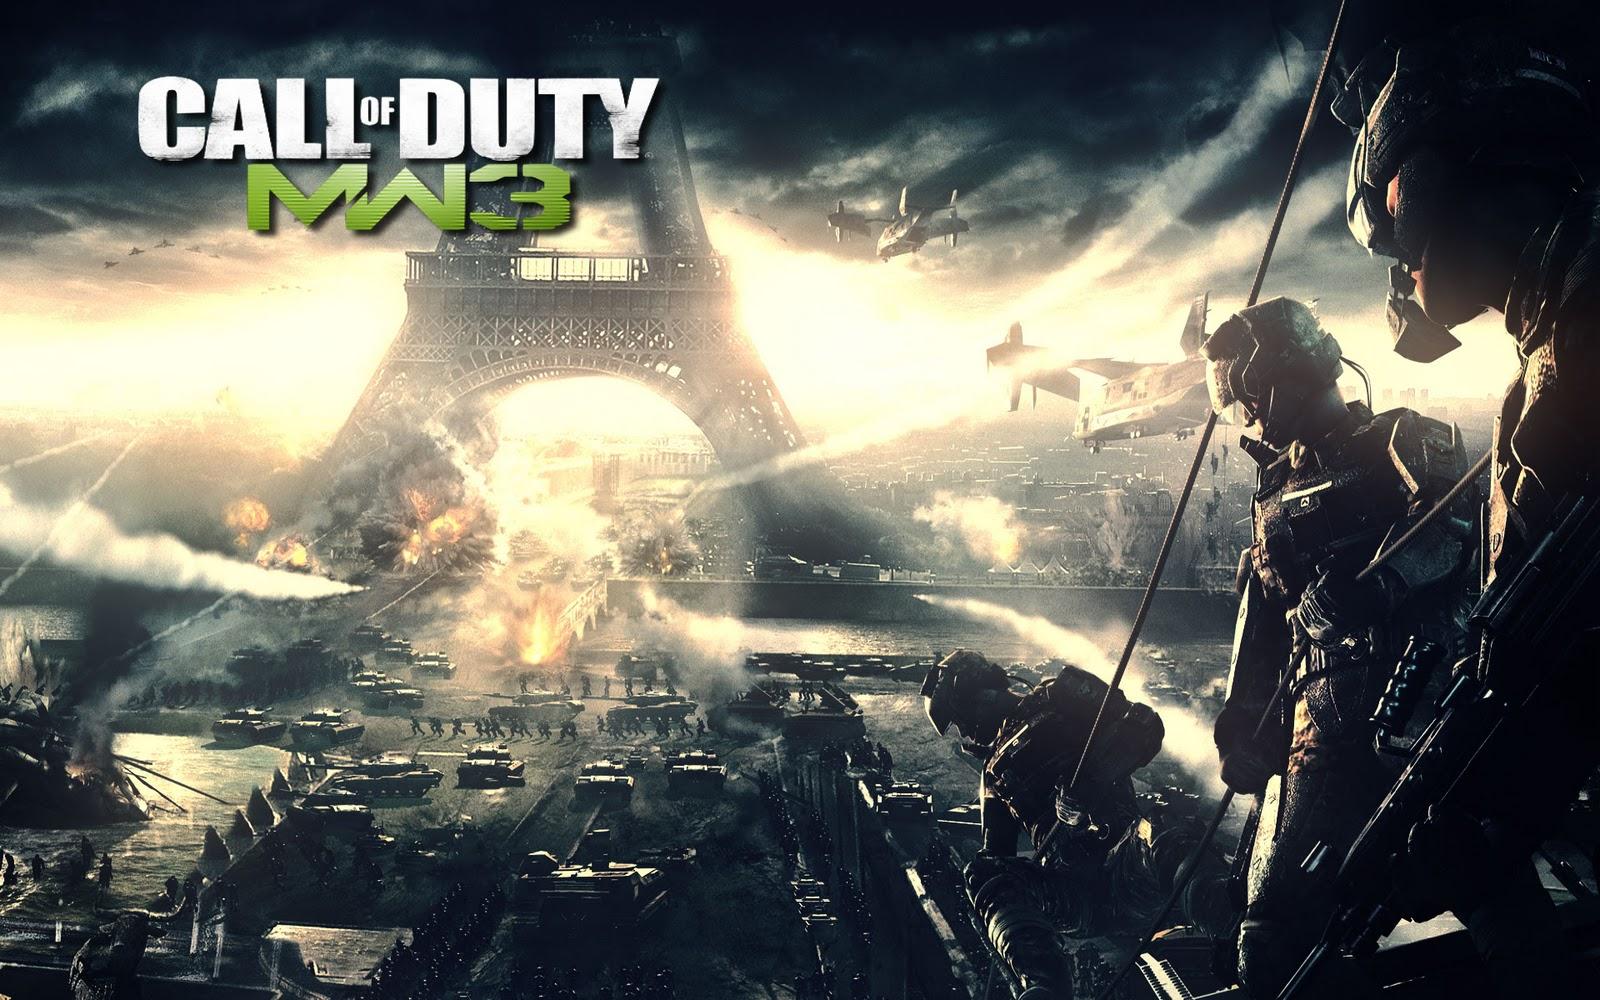 74+] Call Of Duty Wallpapers on WallpaperSafari